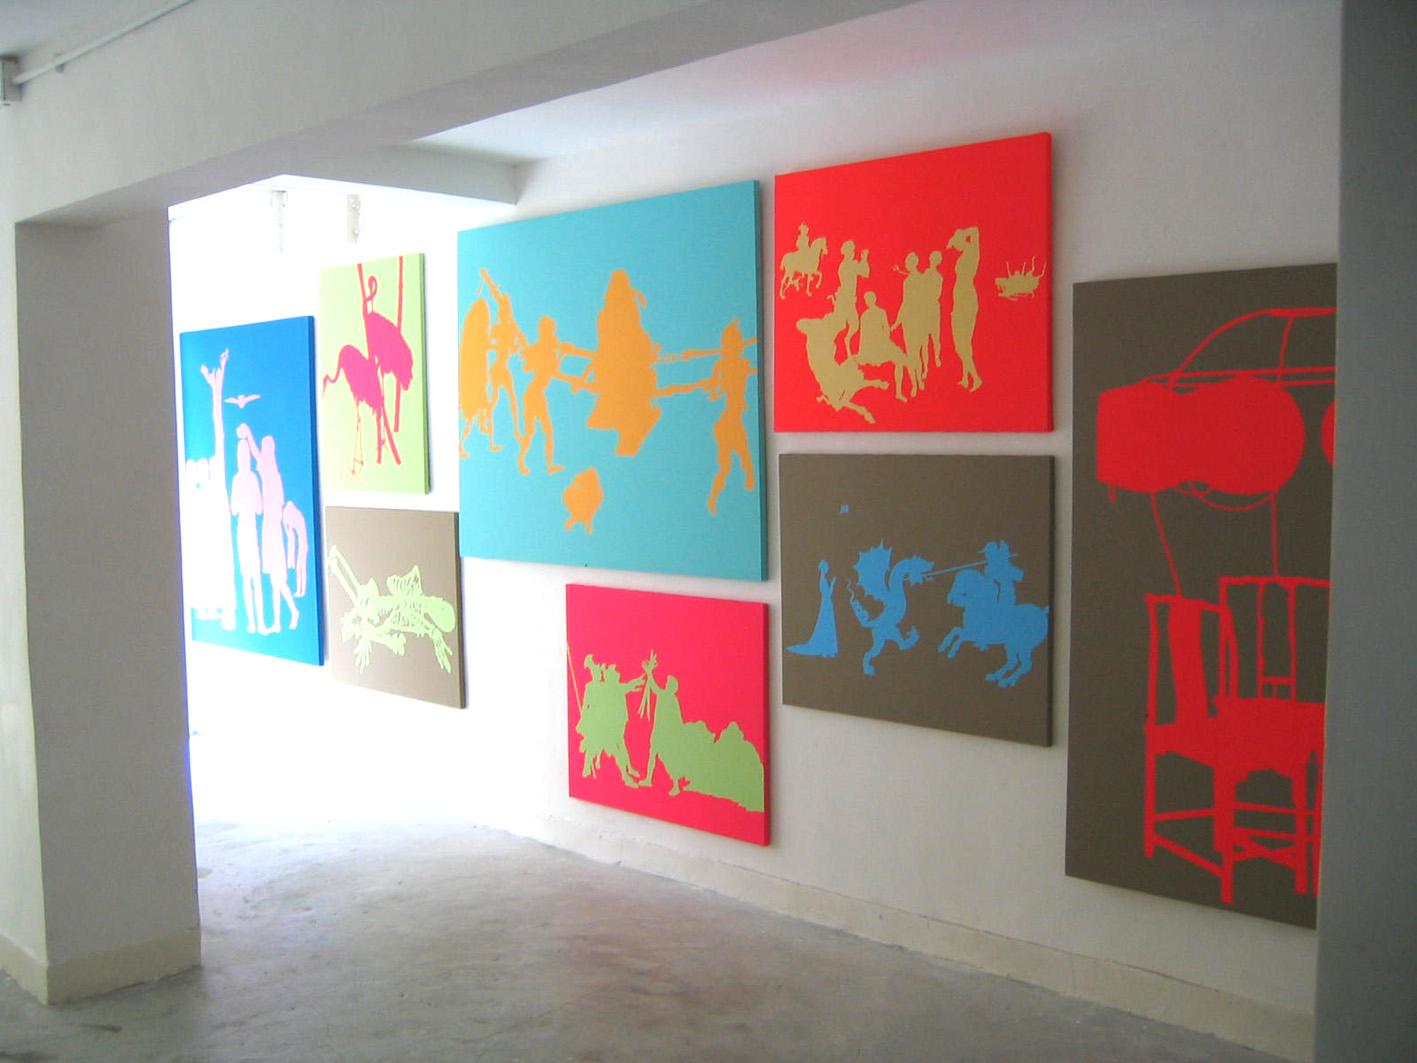 Vue de l'exposition chinese shadows 09